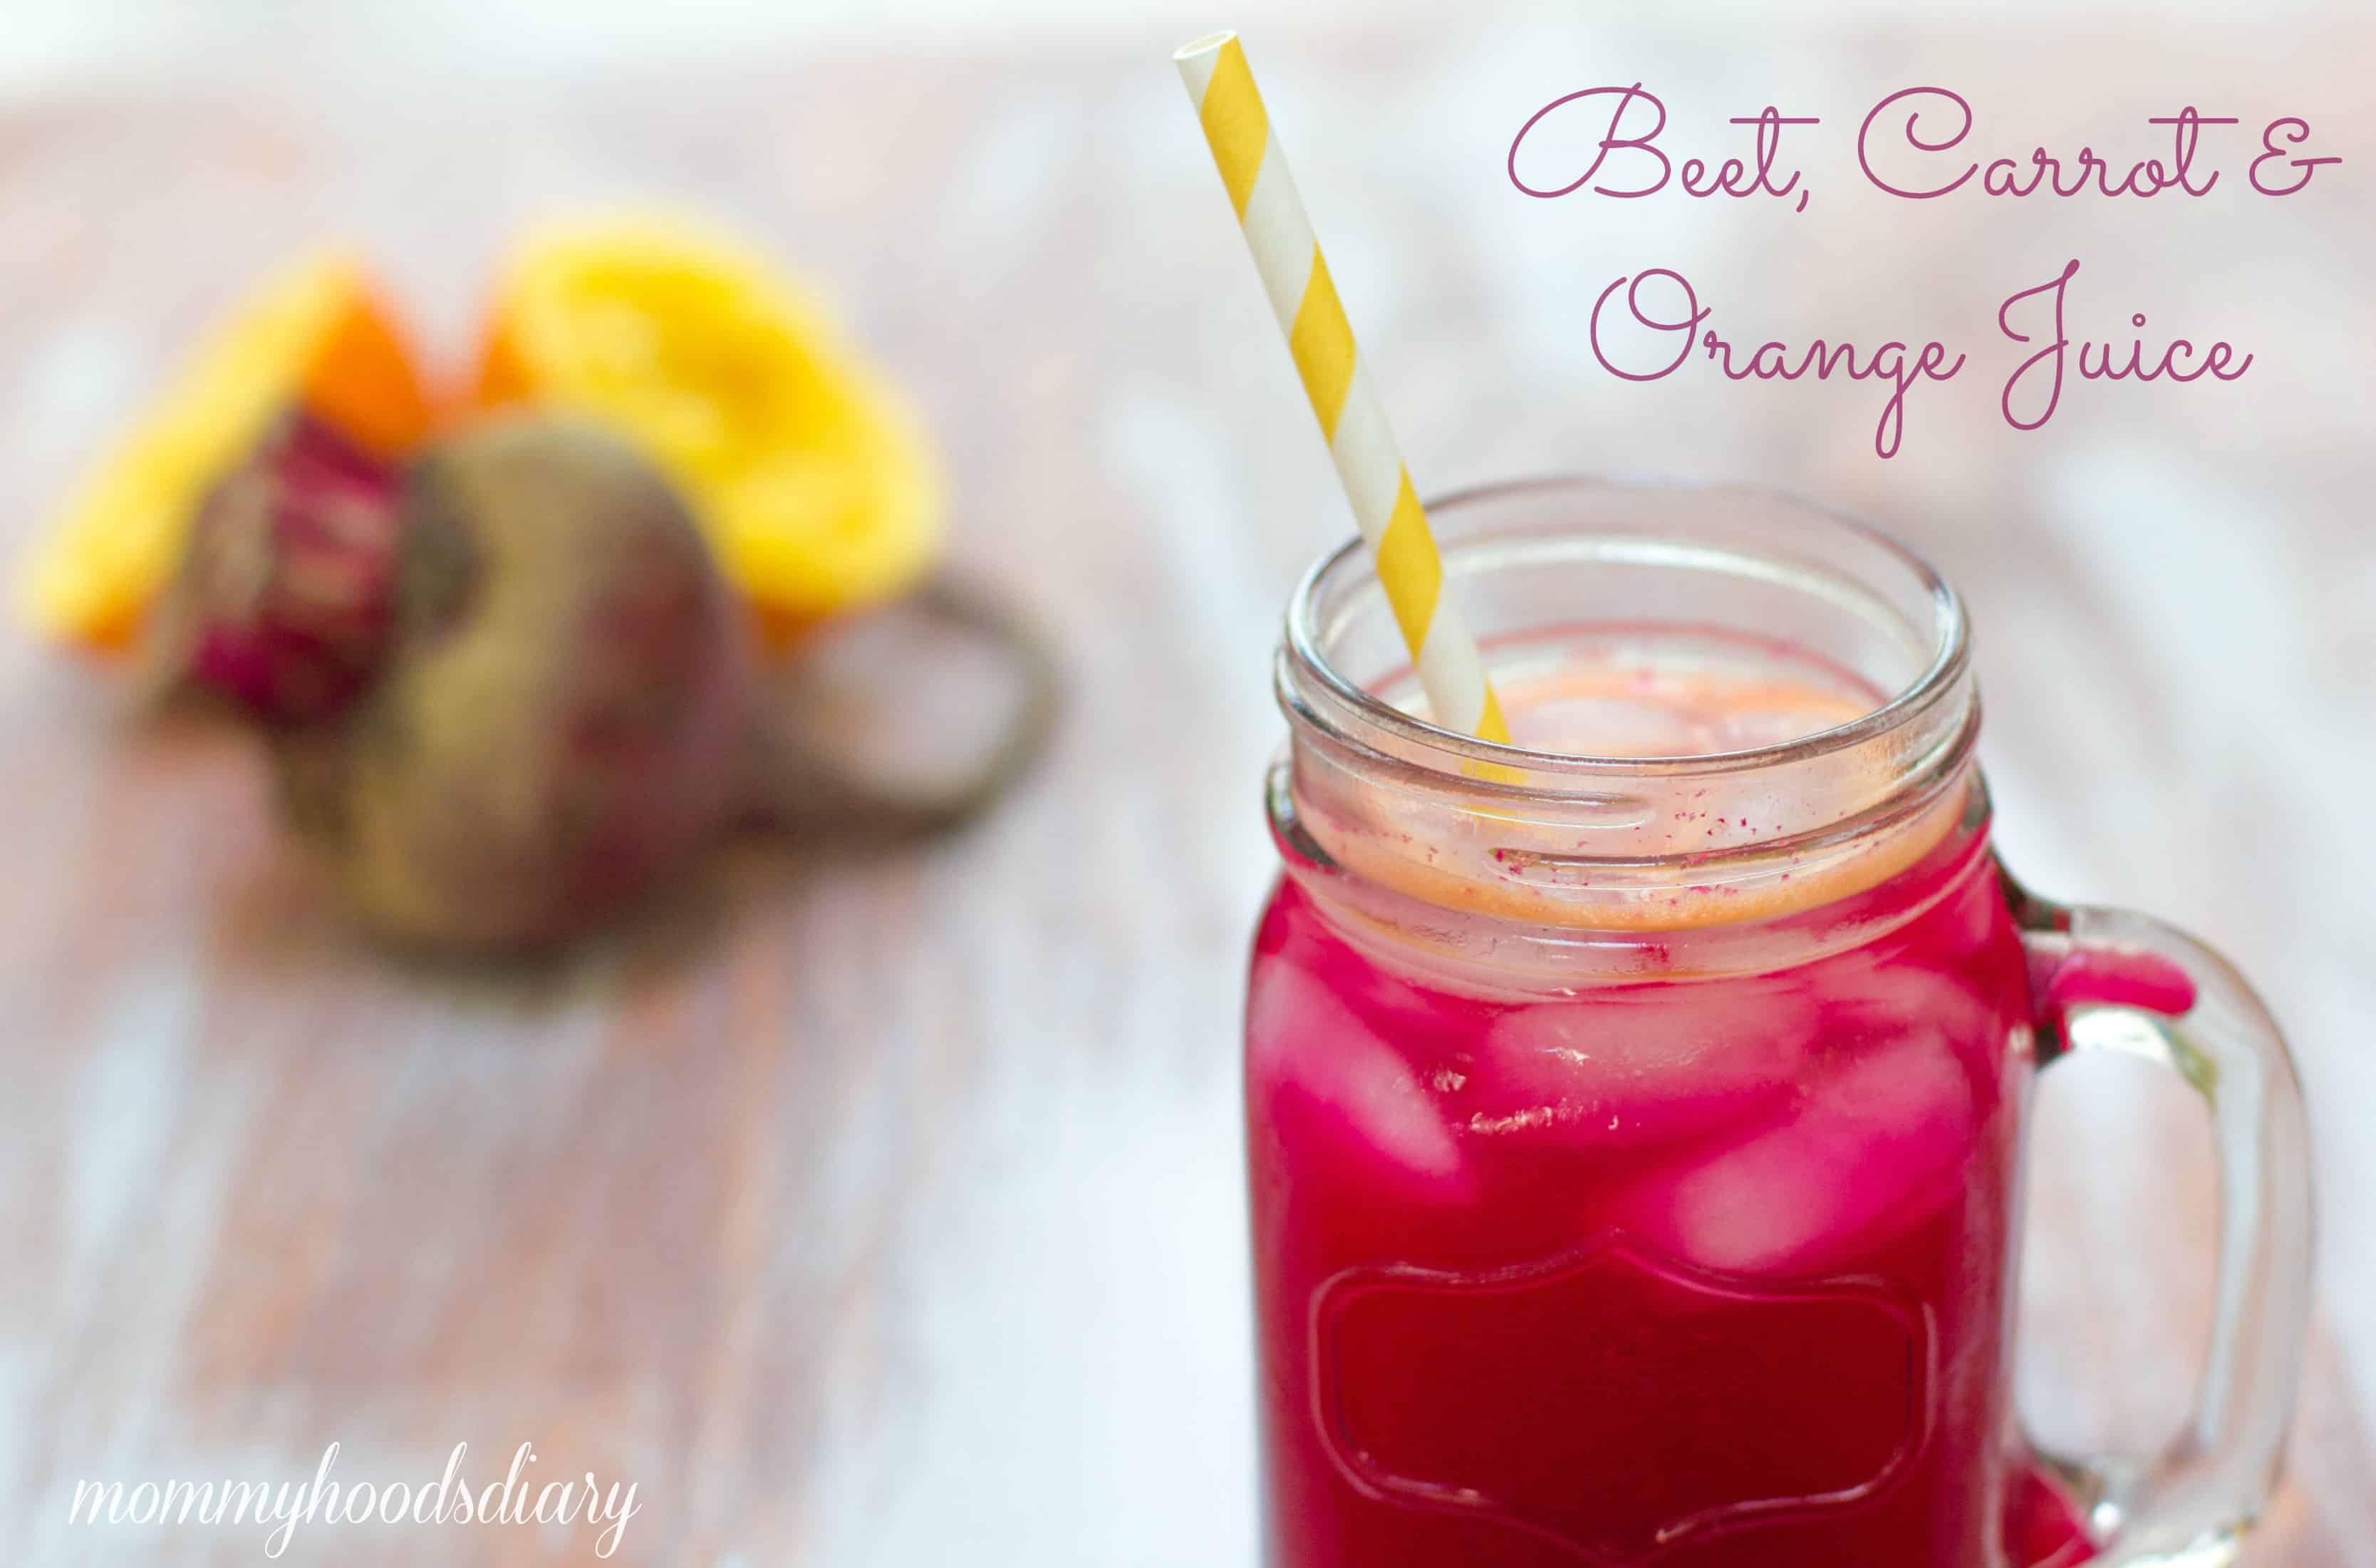 Beet, Carrot & Orange Juice